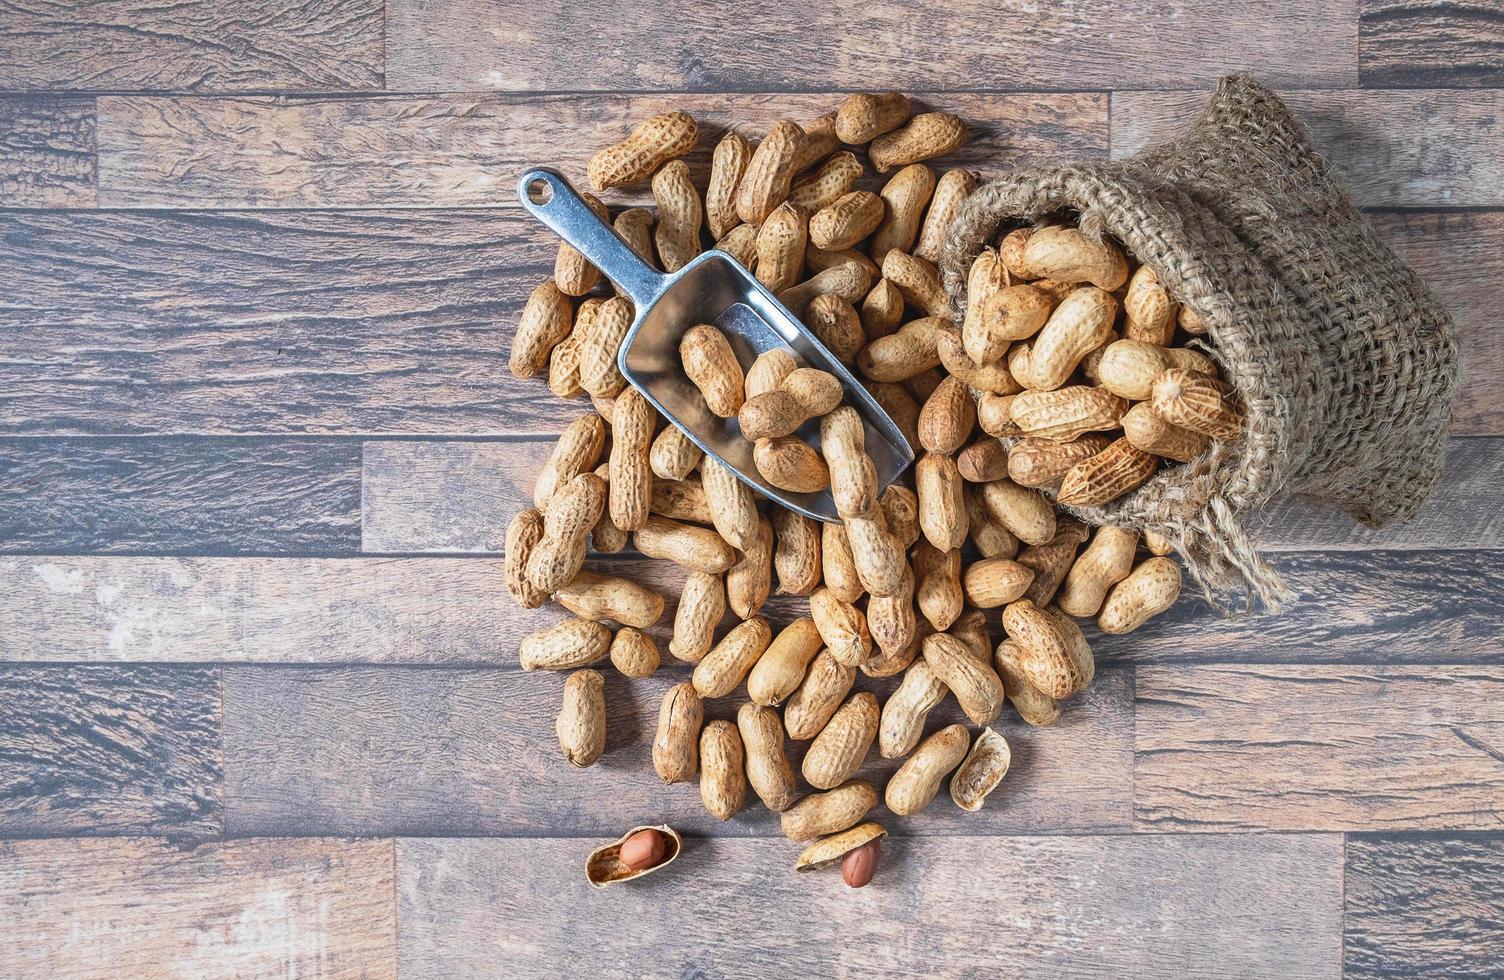 Peanuts in sackcloth photo